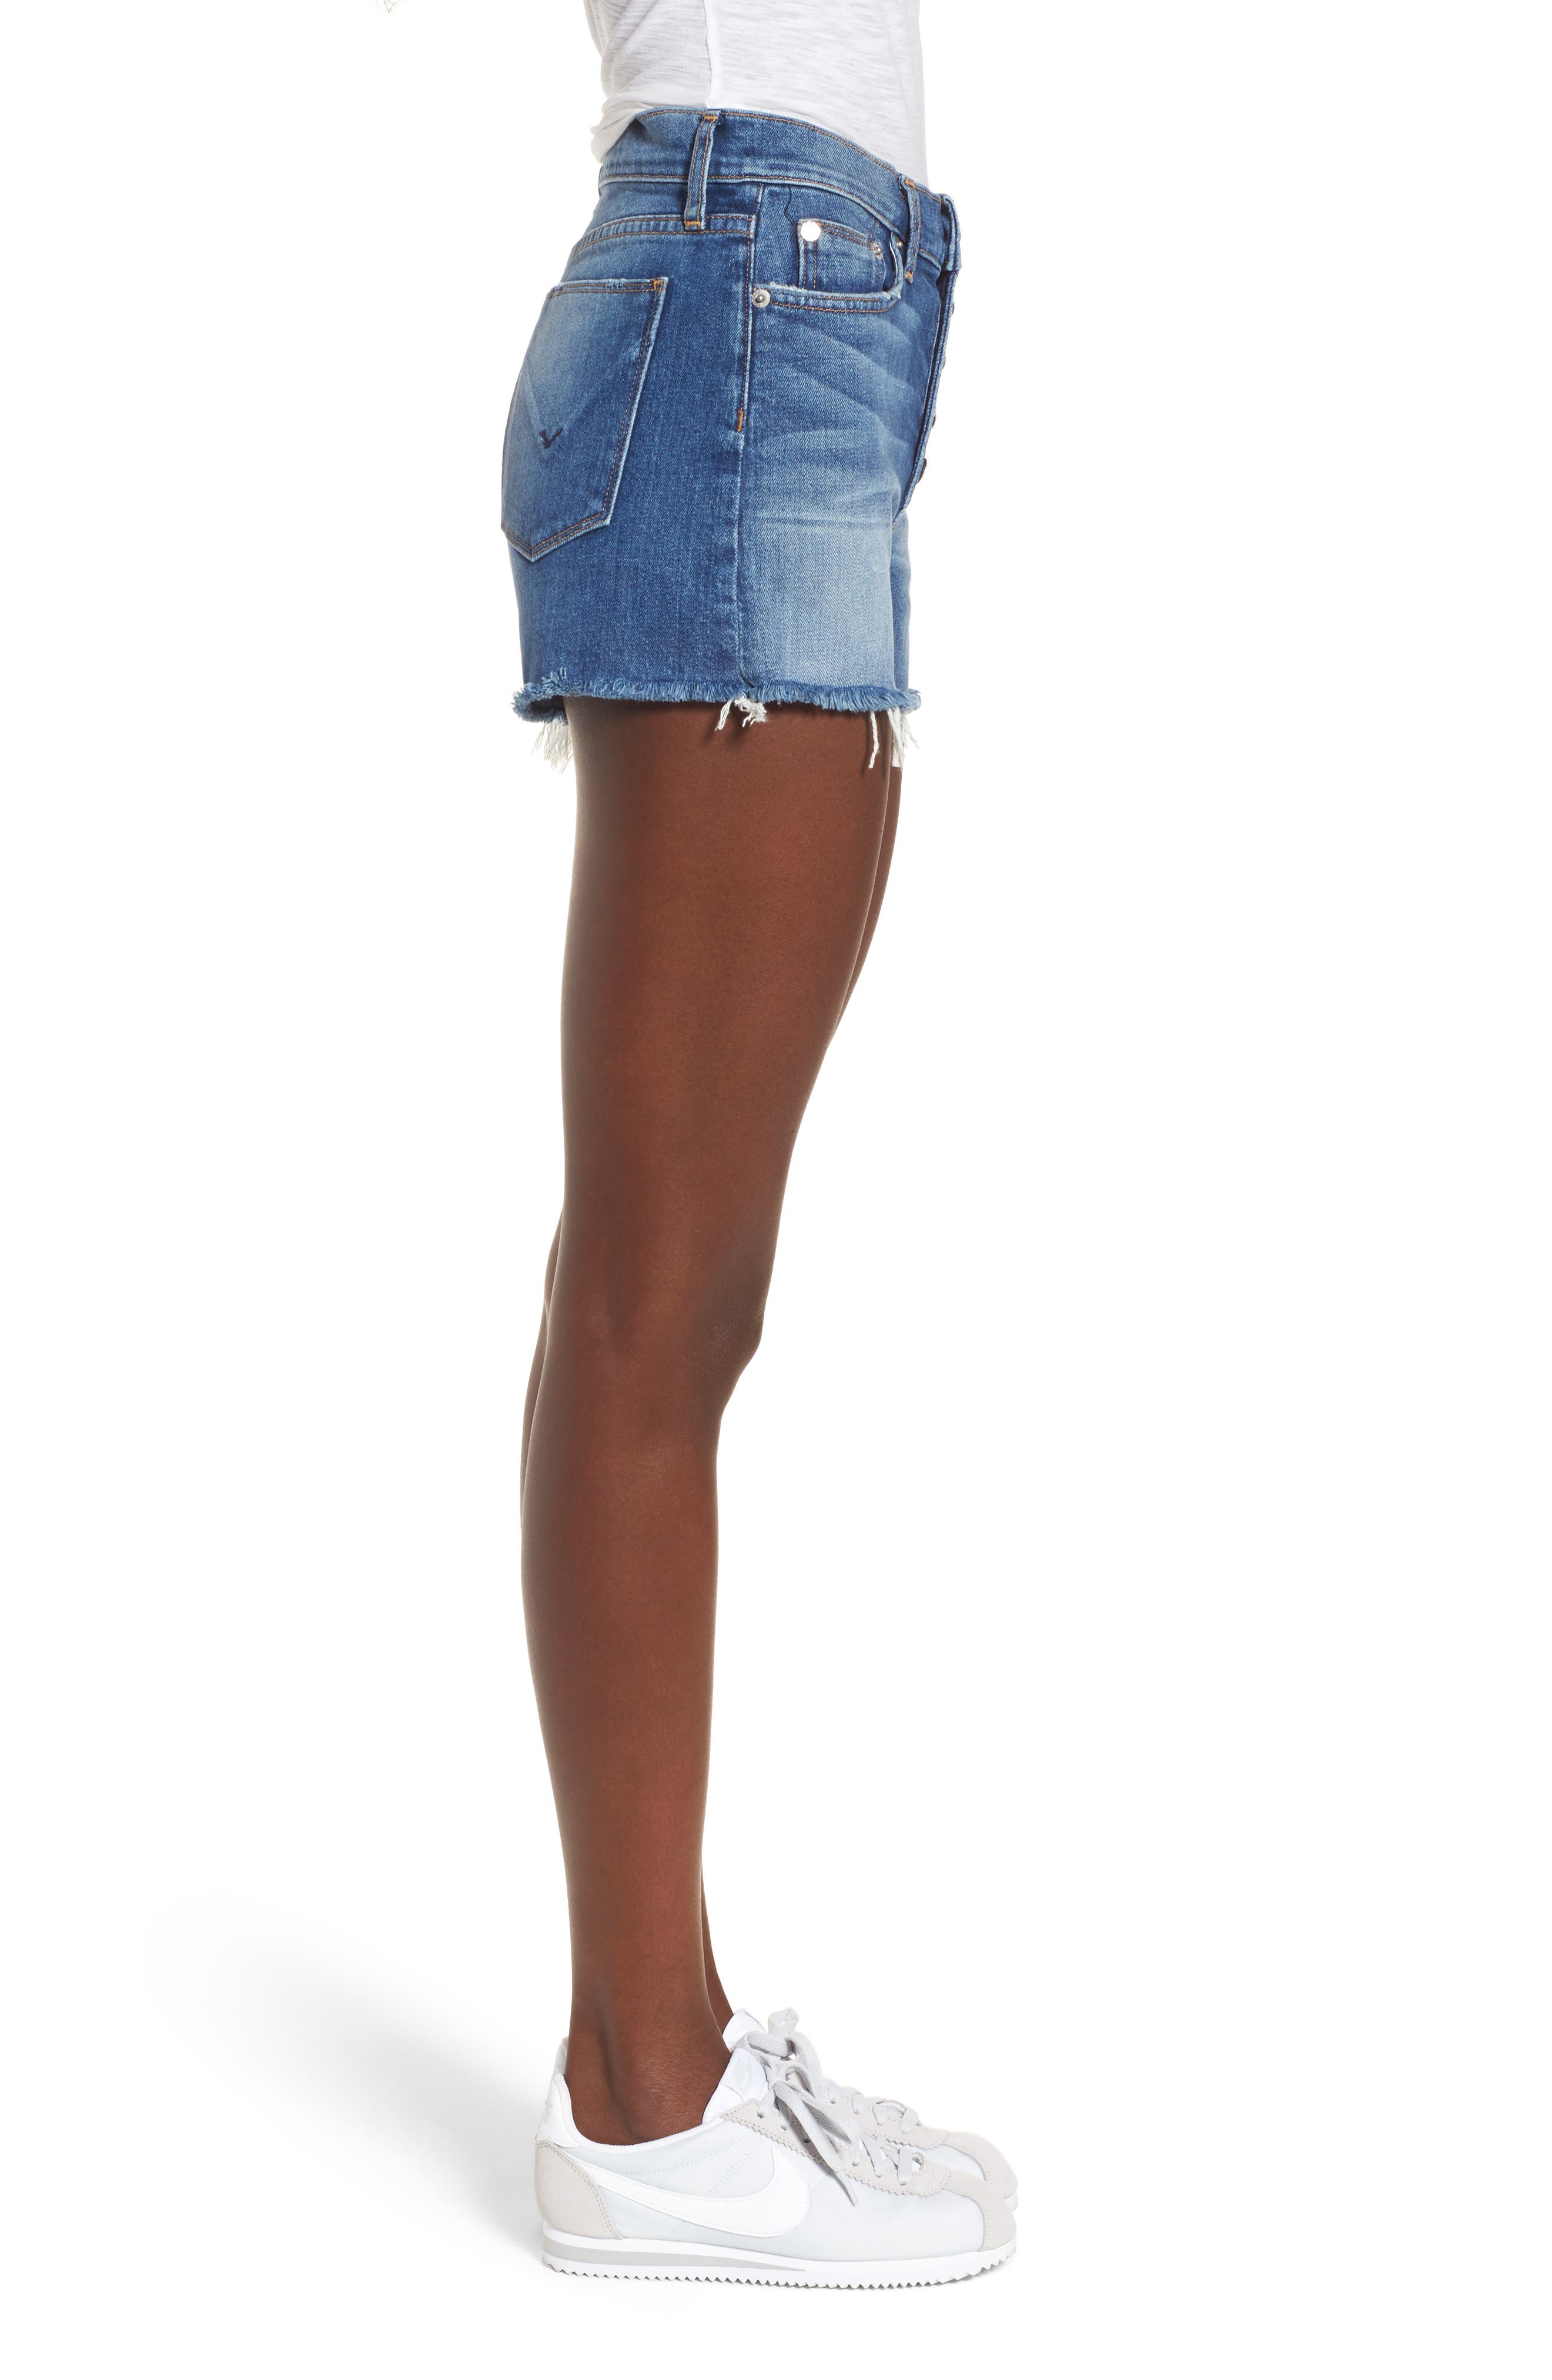 Zoeey High Waist Cutoff Denim Shorts,                             Alternate thumbnail 3, color,                             Doll Face